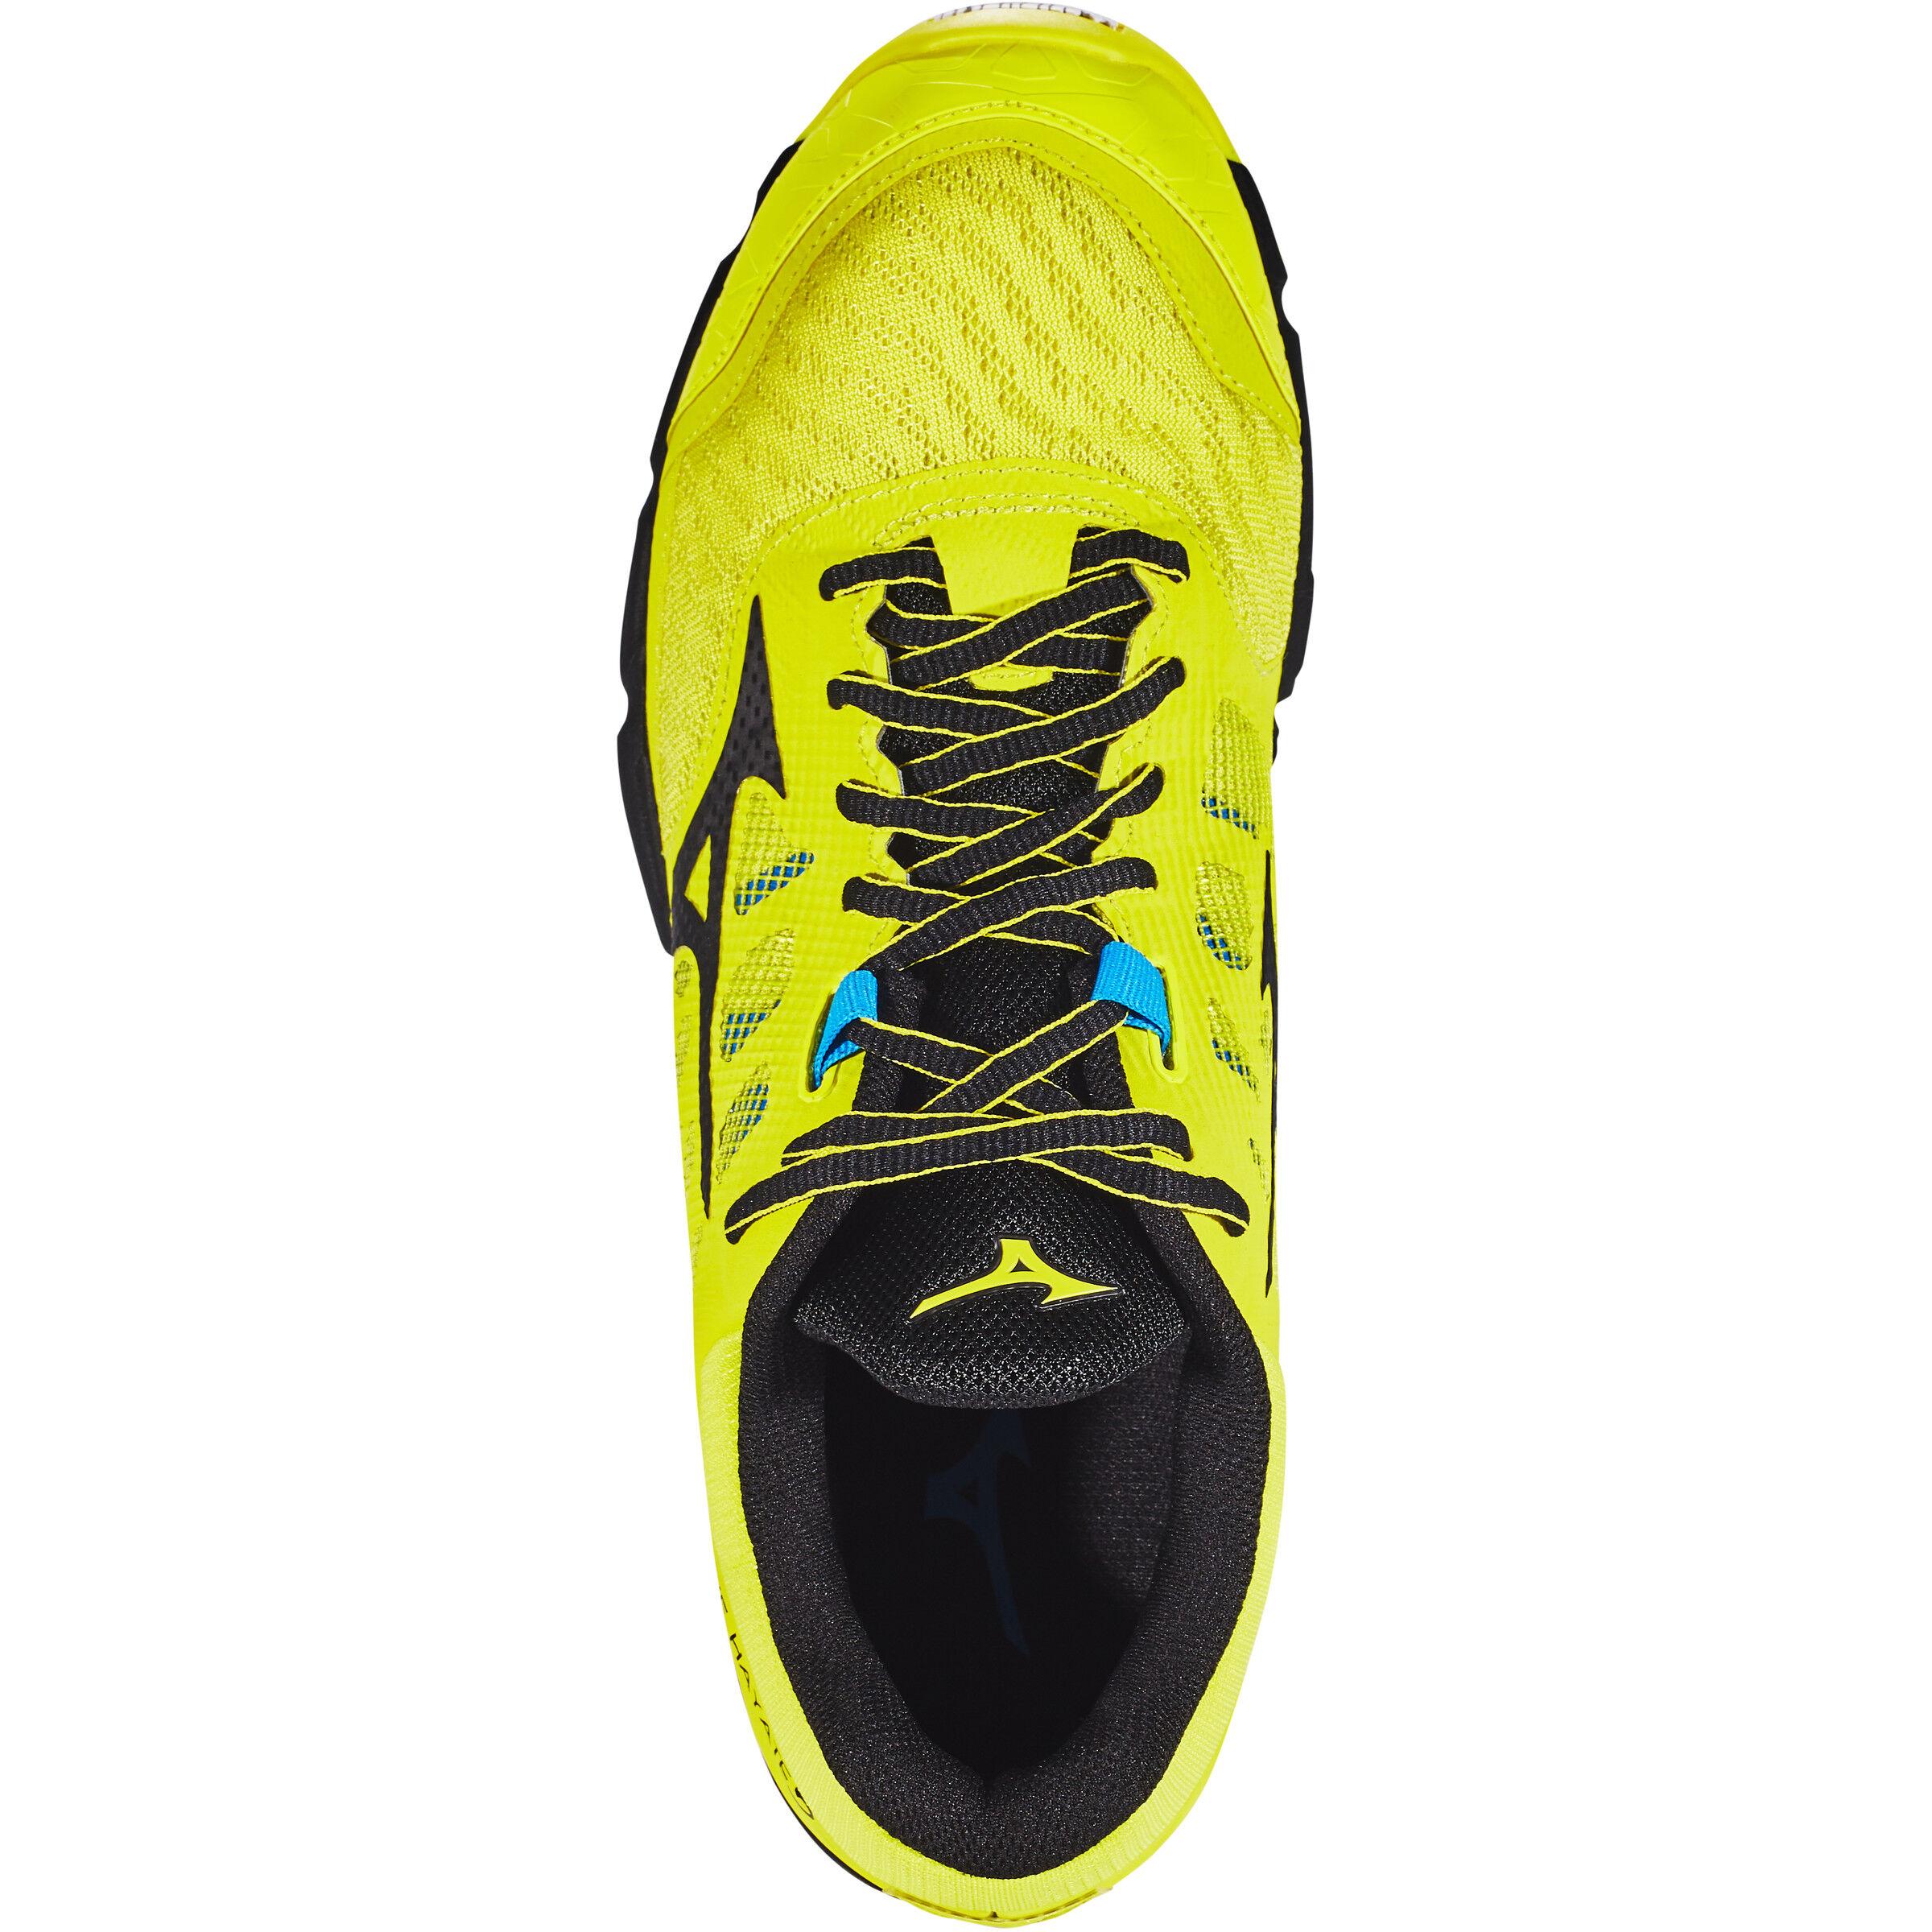 Mizuno Wave Hayate 5 Shoes Herren boltblack